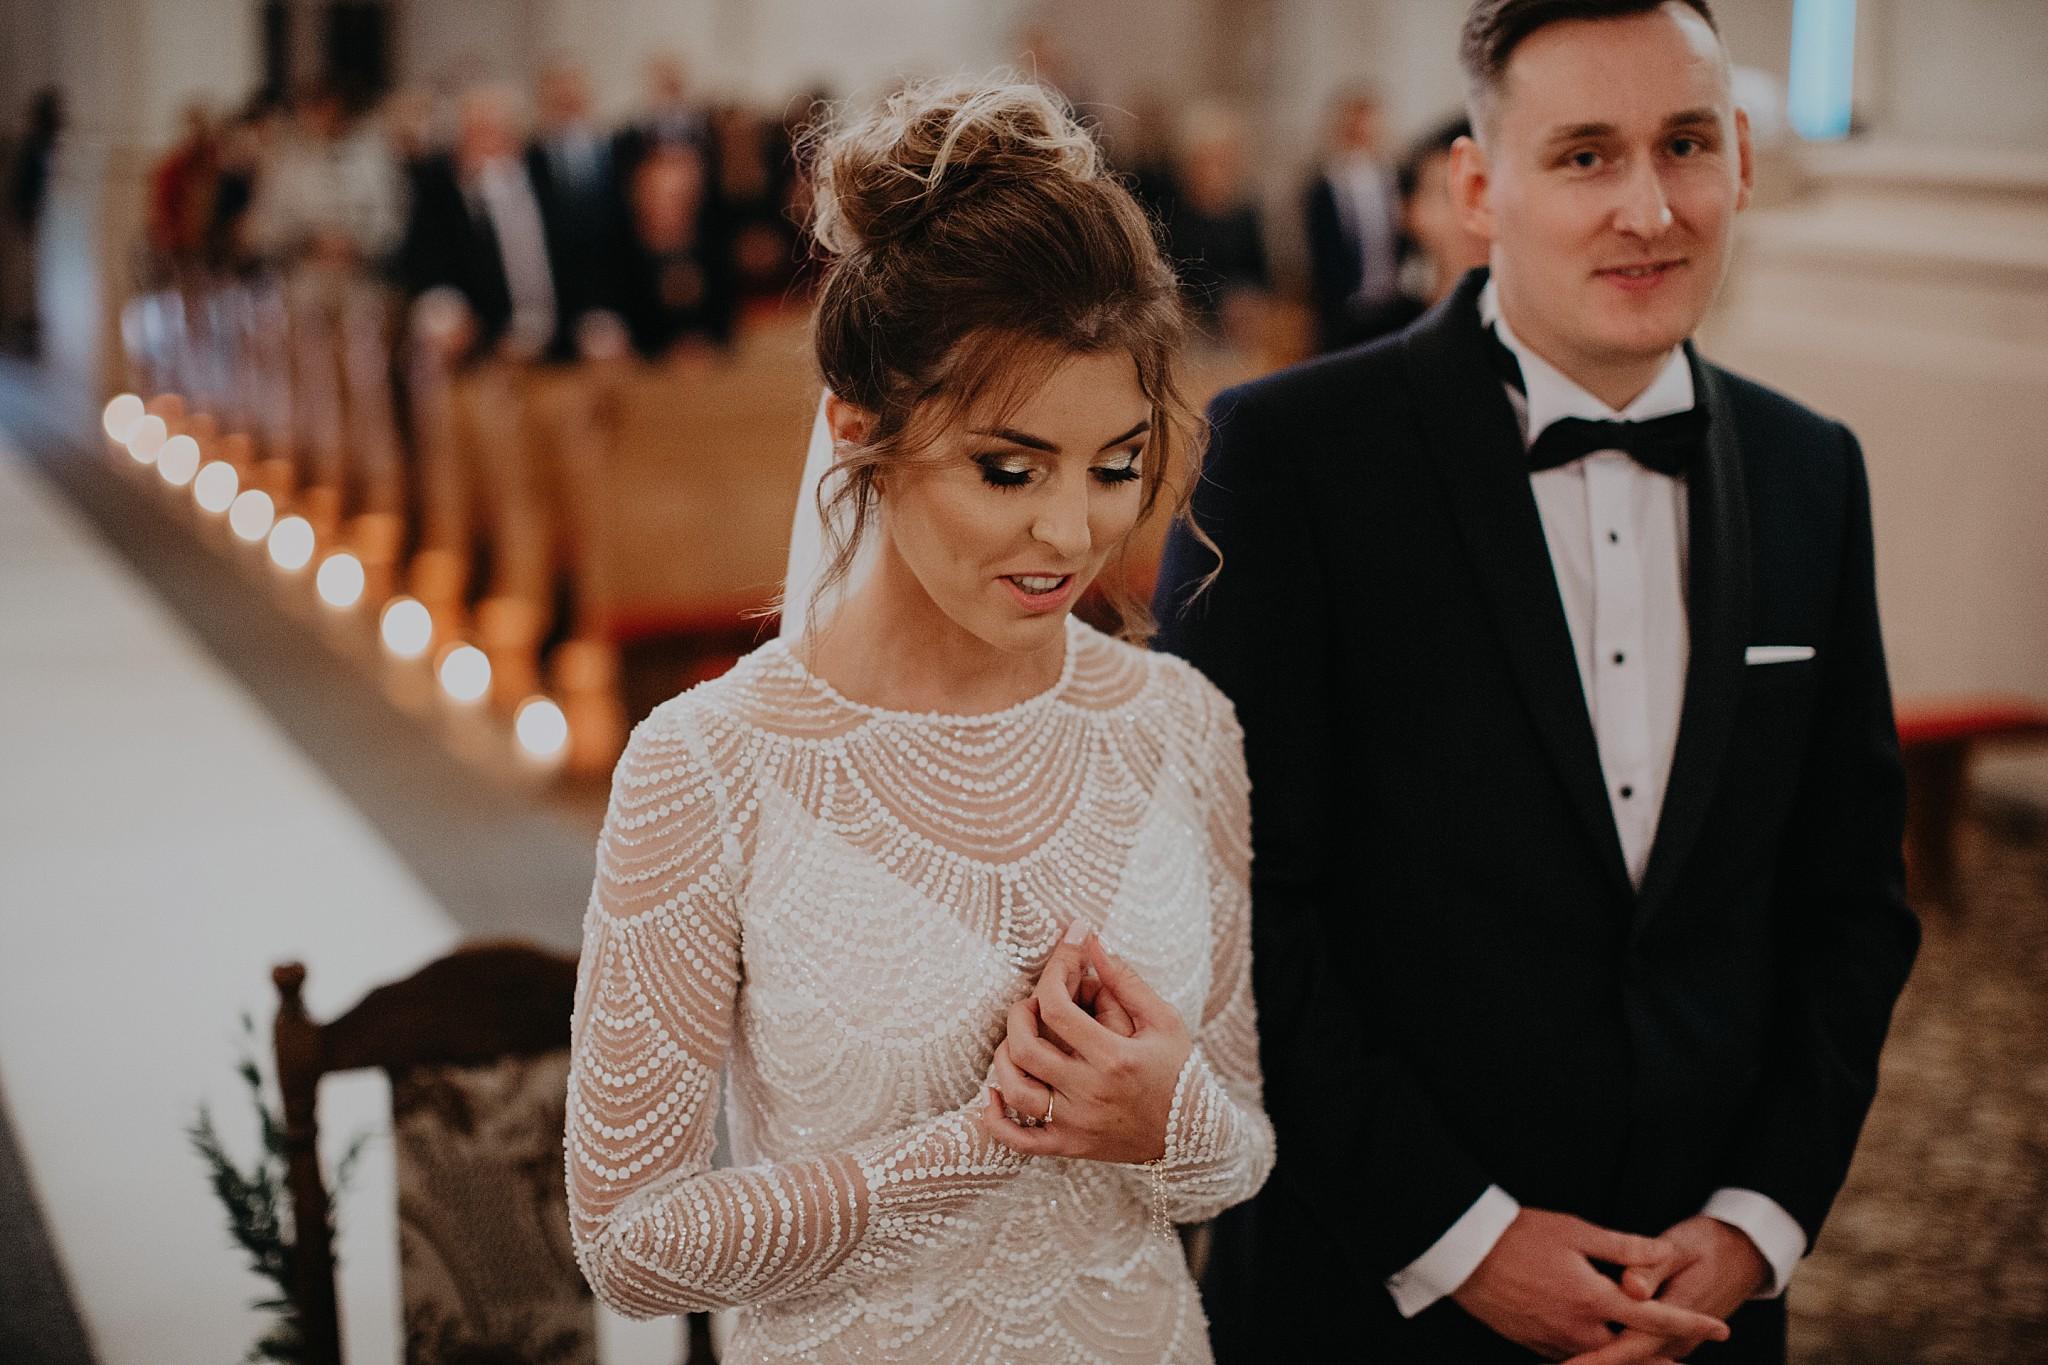 fotograf poznan wesele dobra truskawka piekne wesele pod poznaniem wesele w dobrej truskawce piekna para mloda slub marzen slub koronawirus slub listopad wesele koronawirus 193